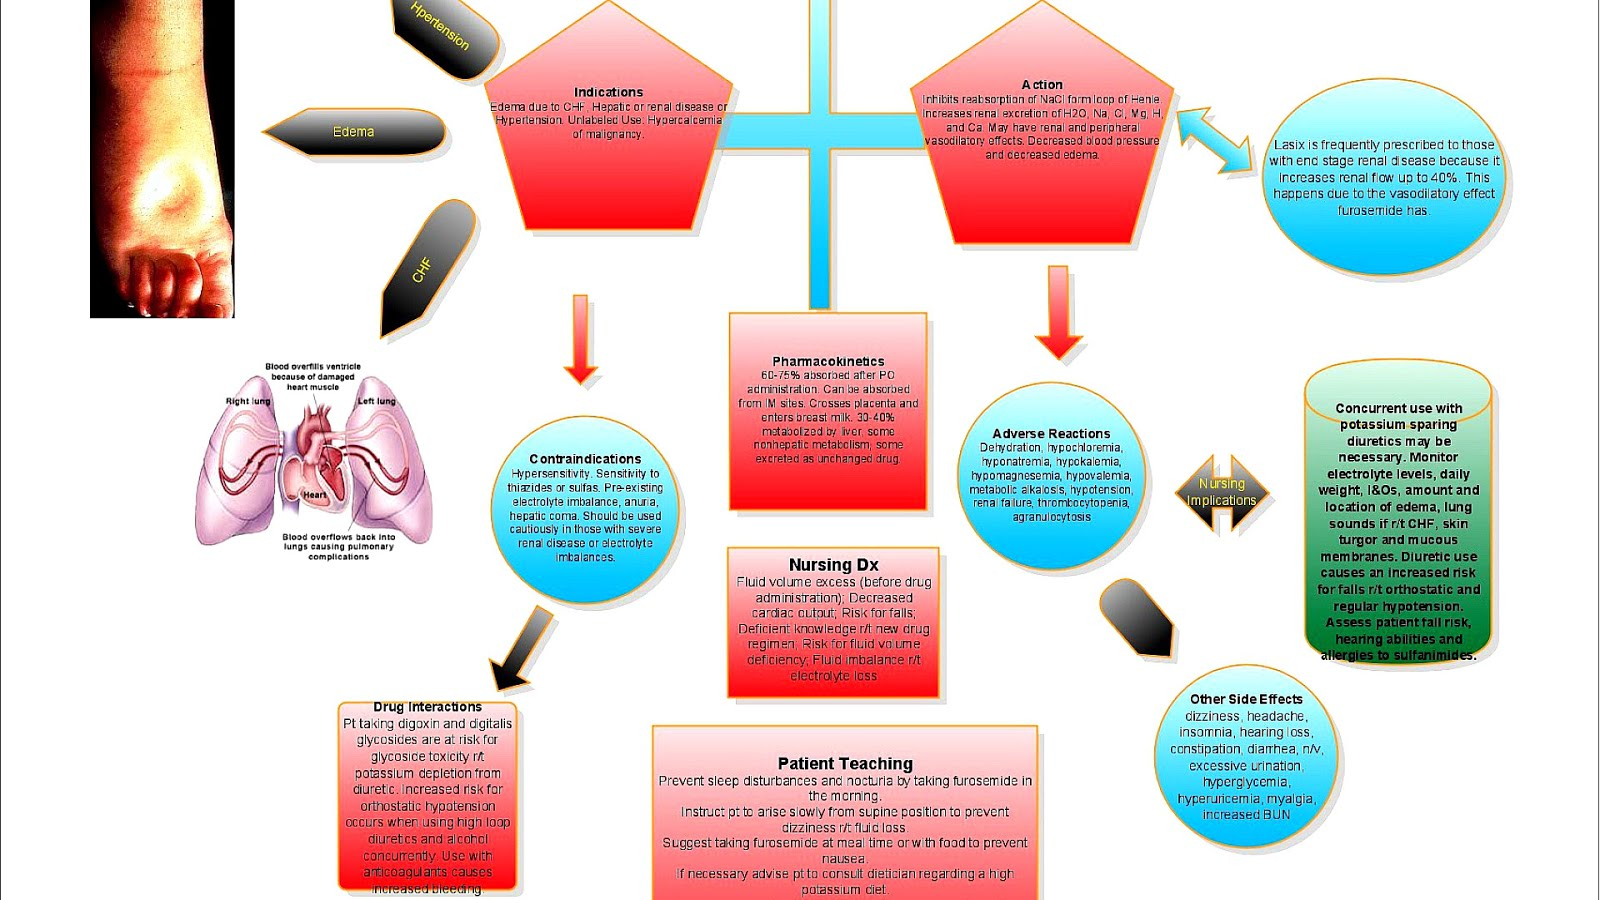 Furosemide - Lasix Side Effects - Effect Choices